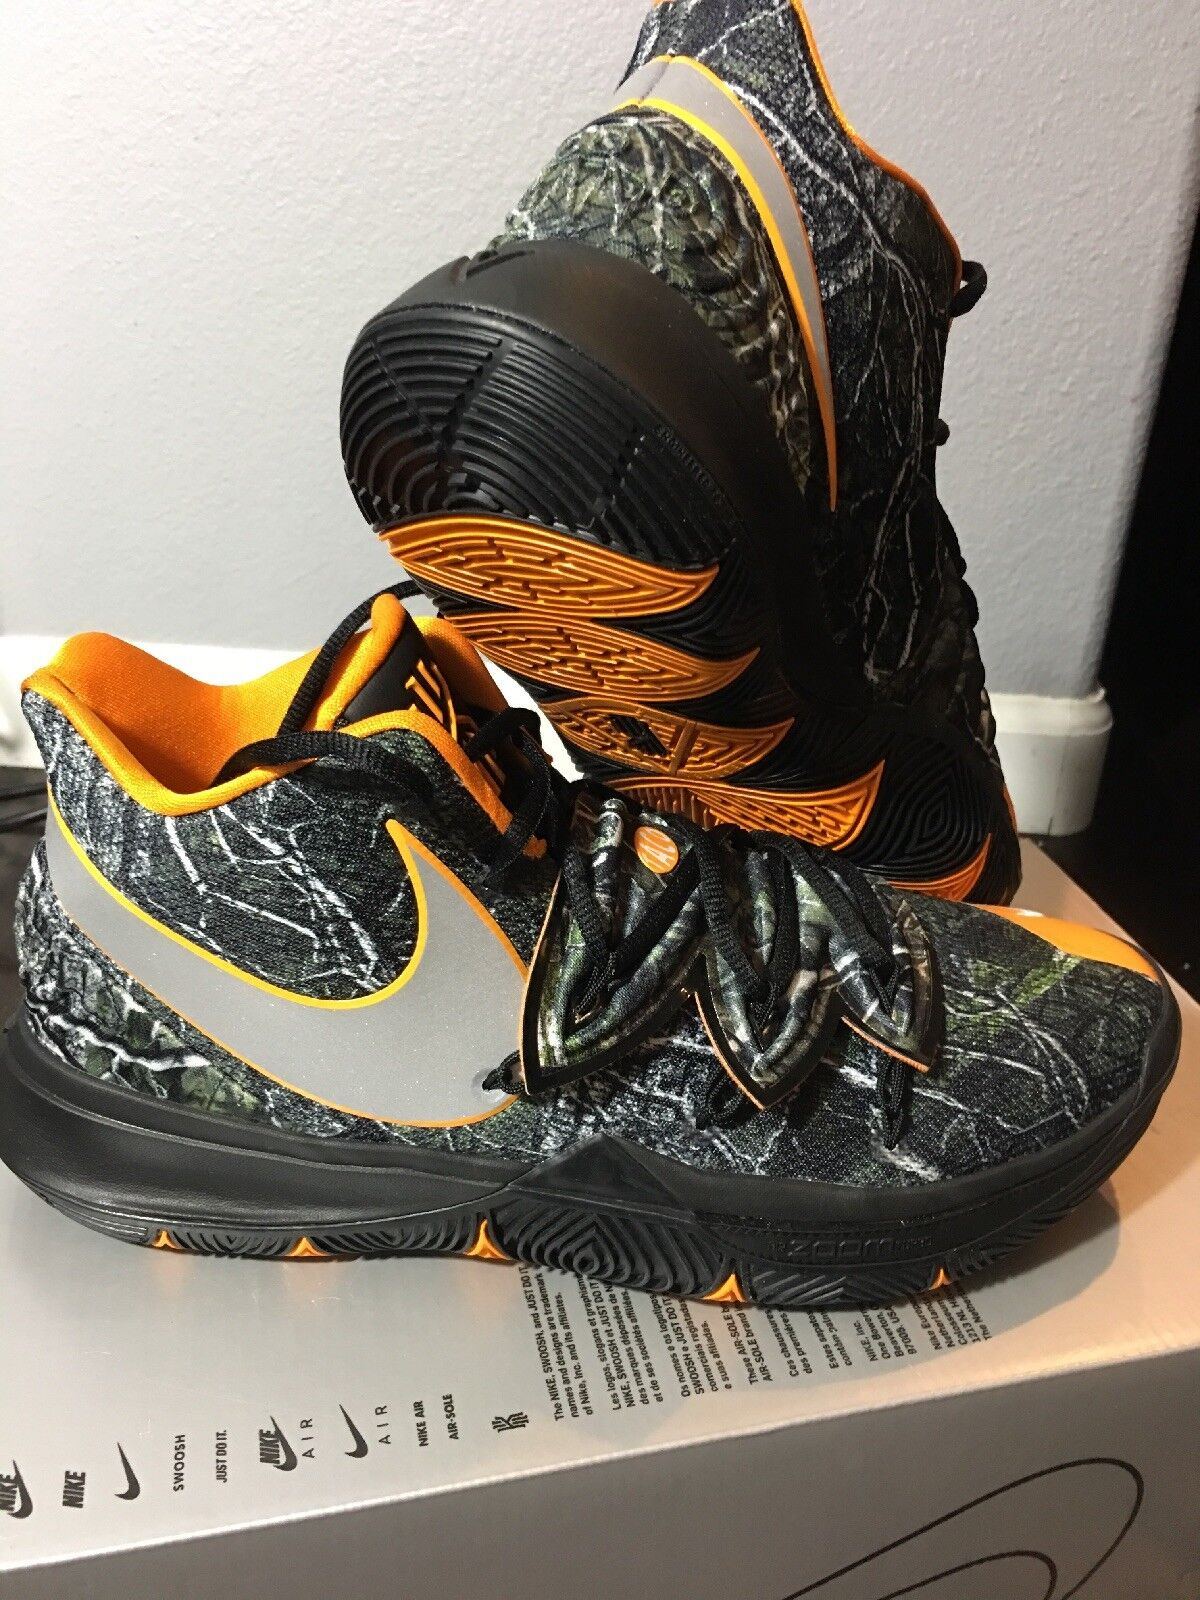 BRAND NEW Nike Kyrie 5 Taco PE Camo orange Black Men's Basketball shoes size 12